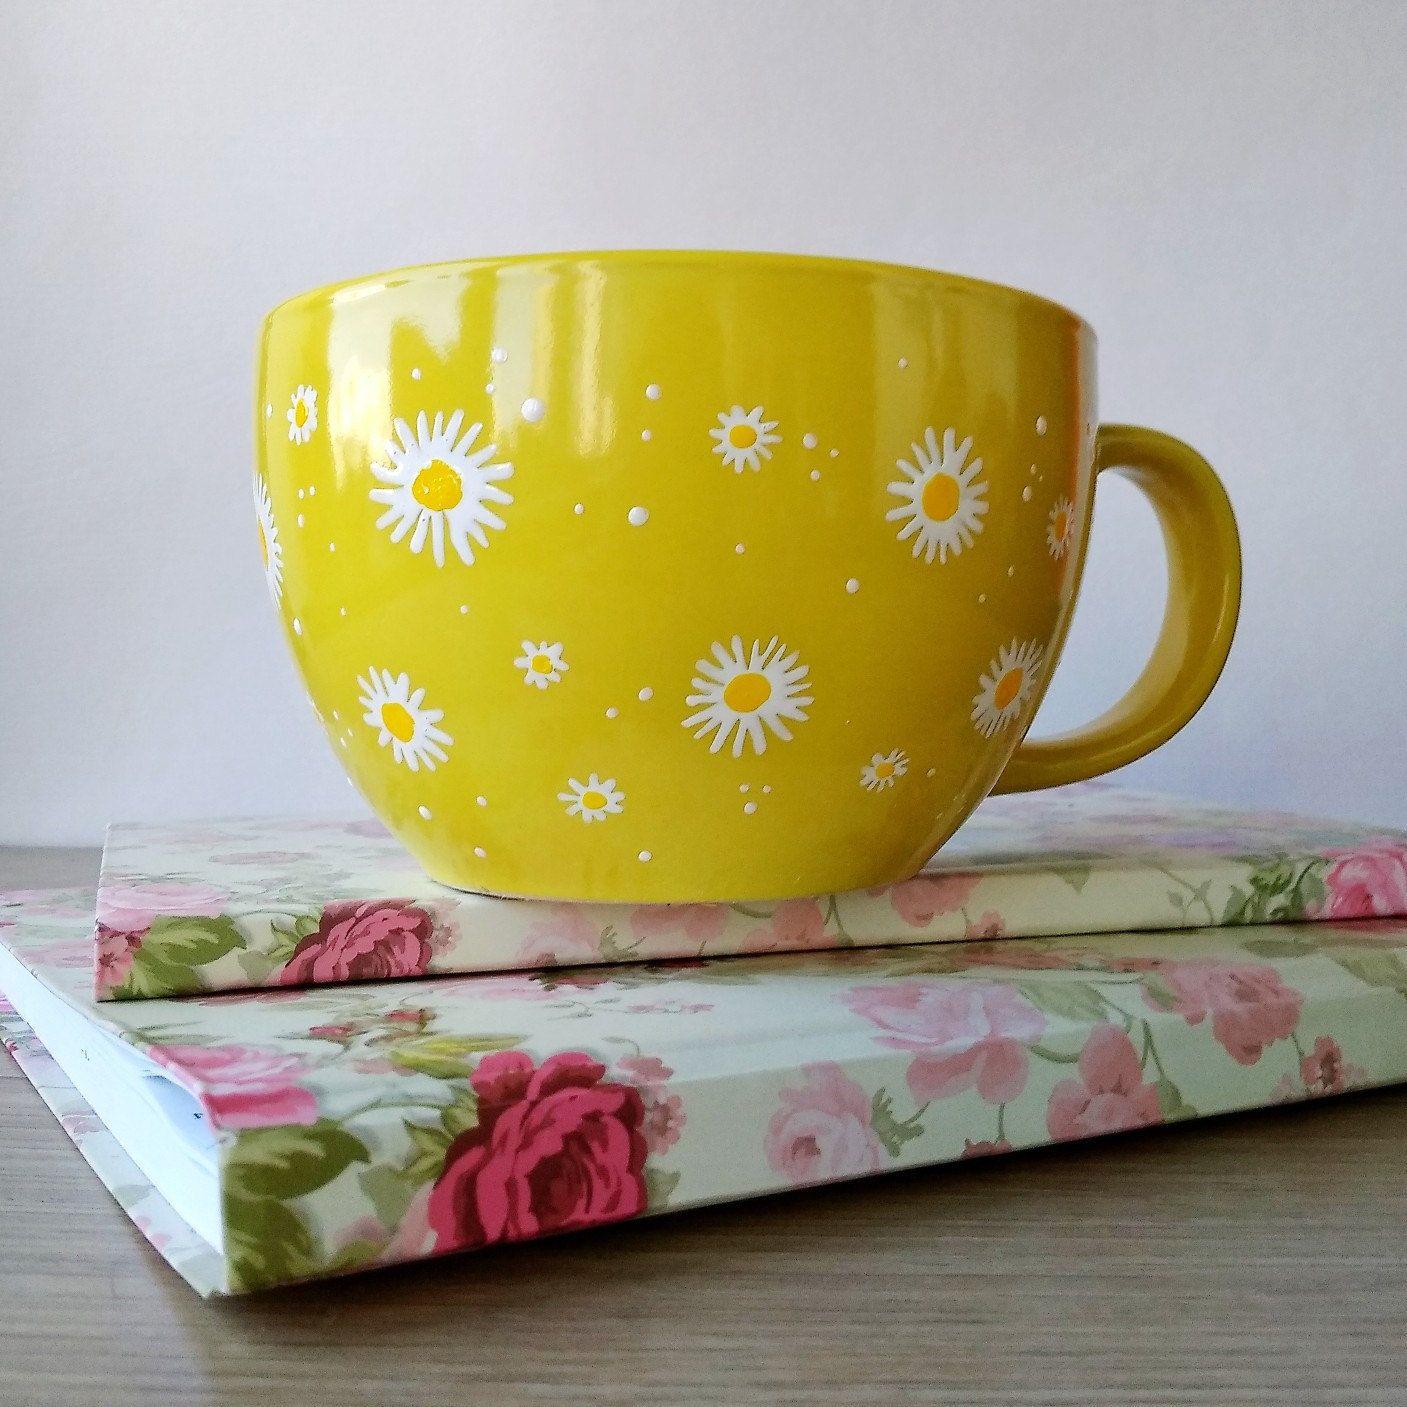 Jumbo ceramic coffee mug, yellow with white daisies #ceramicpainting